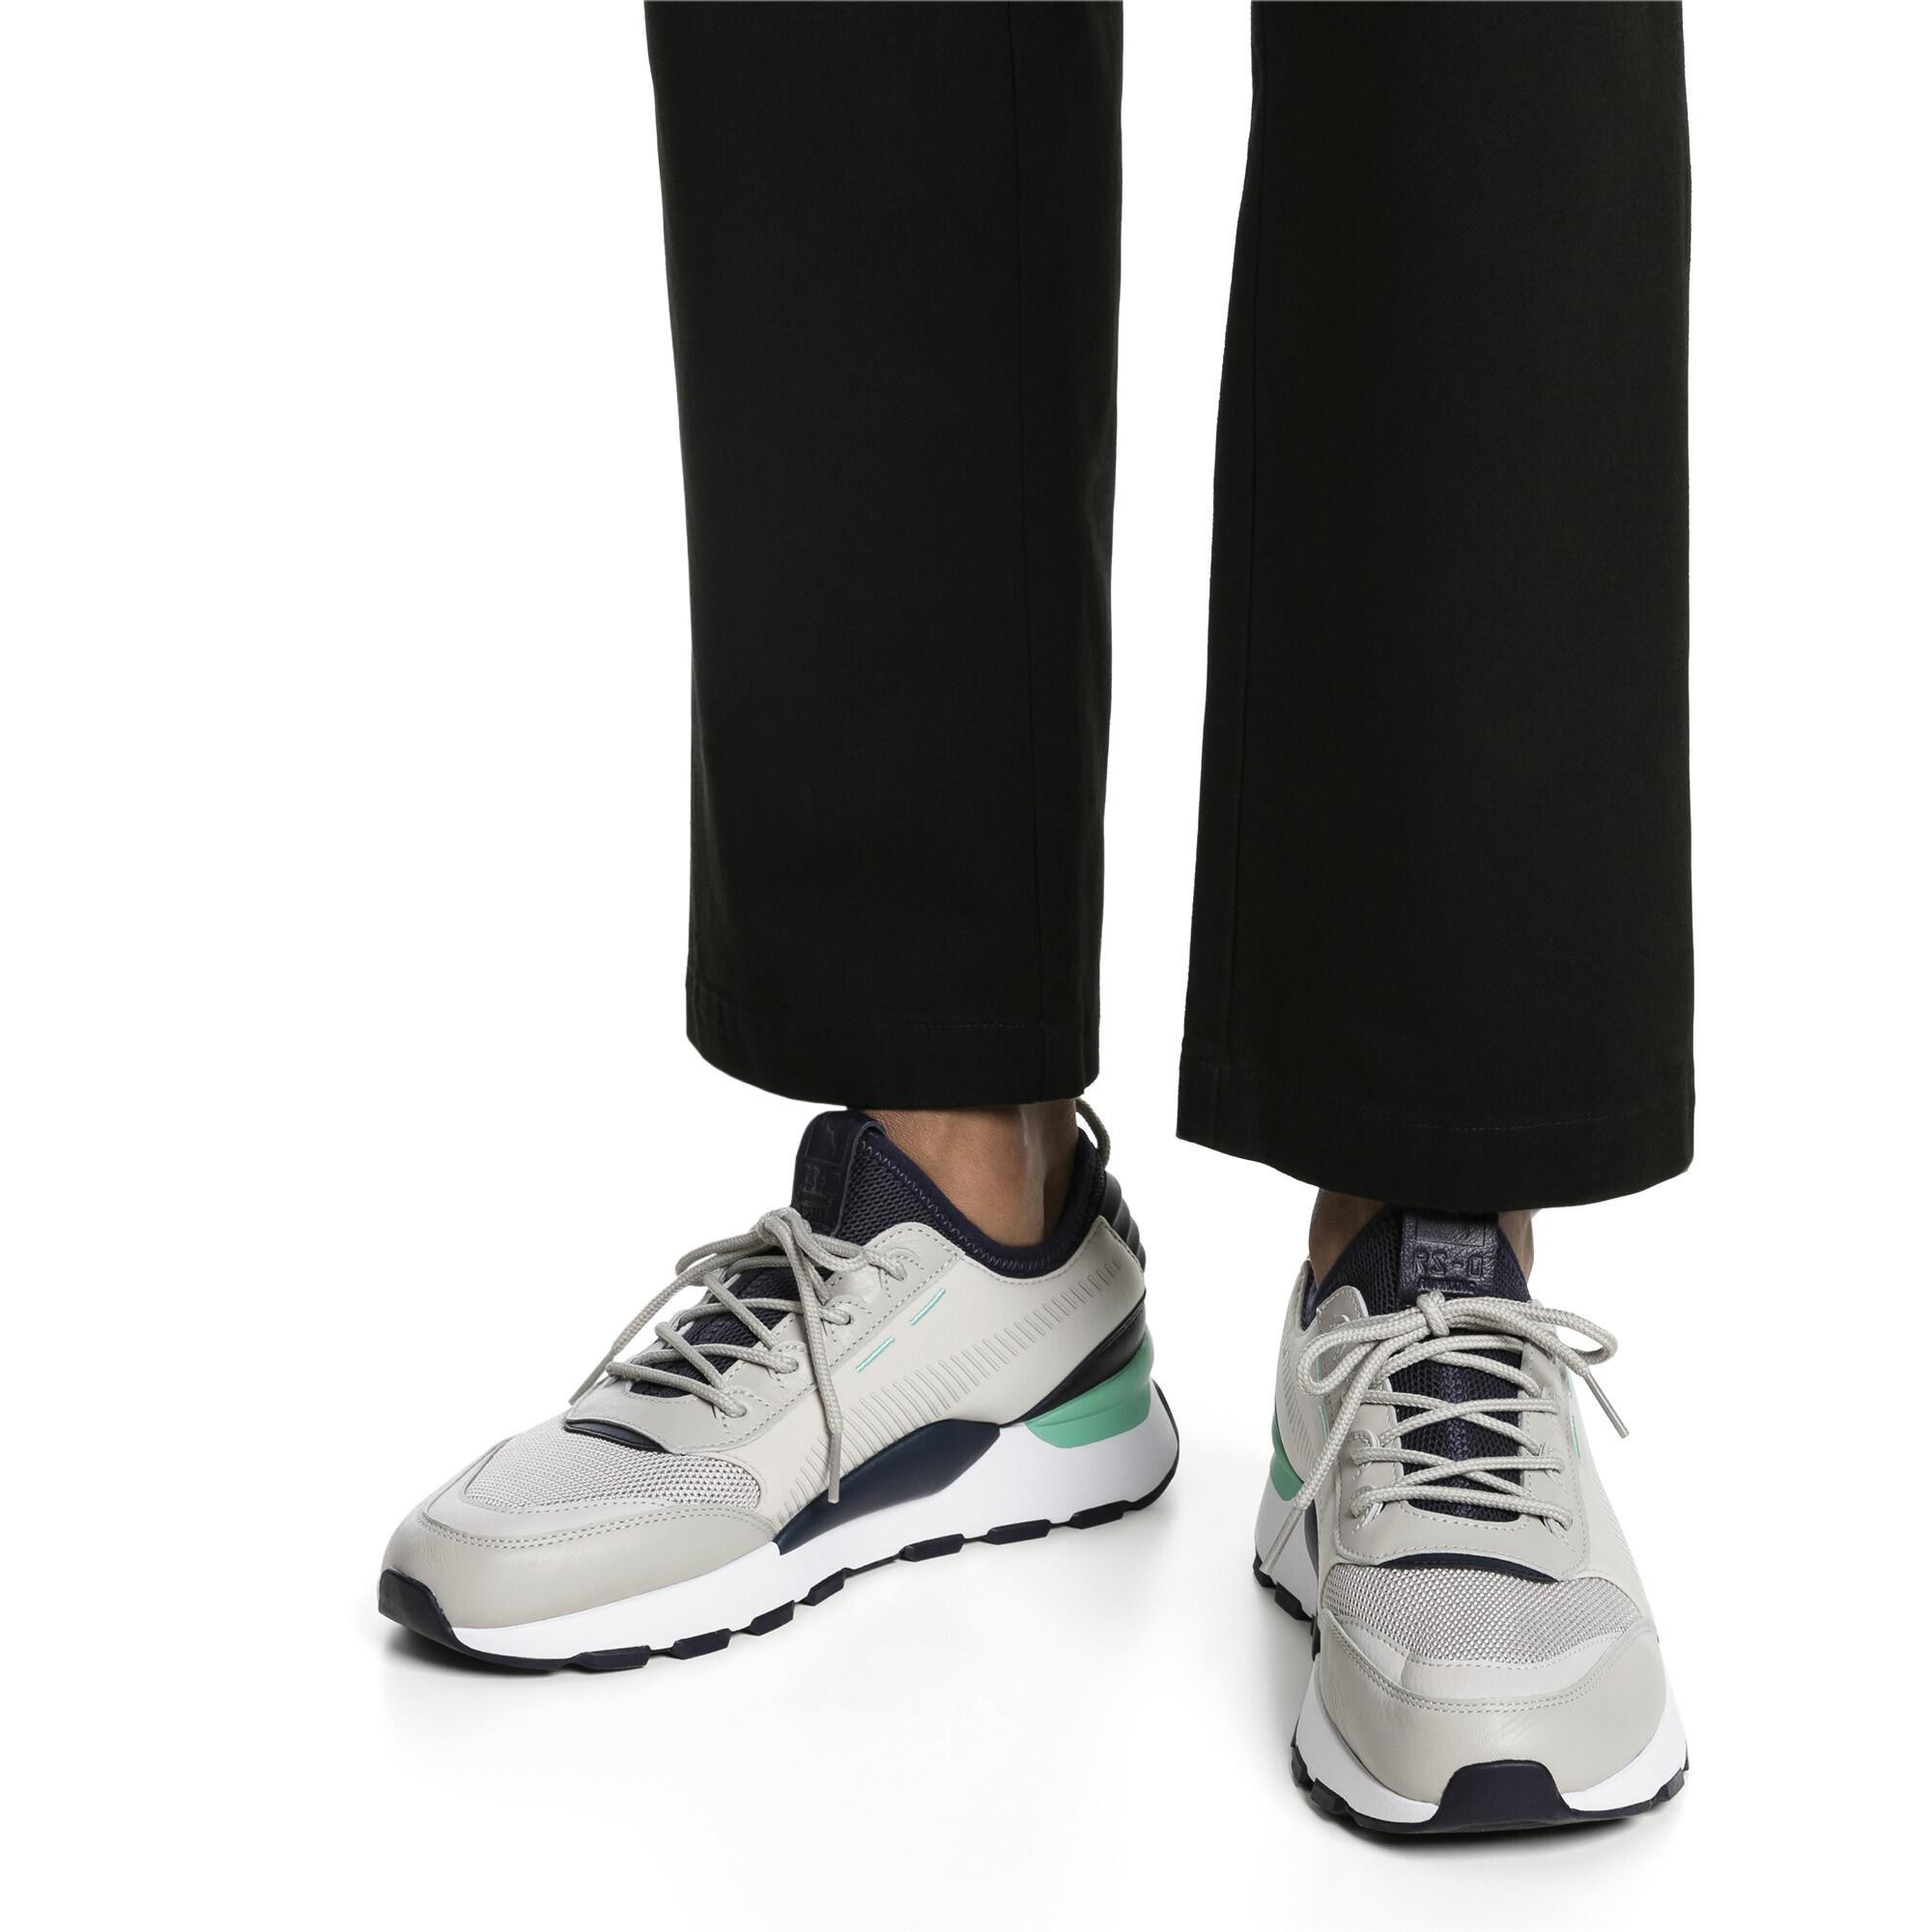 PUMA-RS-0-Tracks-Unisex-Shoe-Evolution thumbnail 5